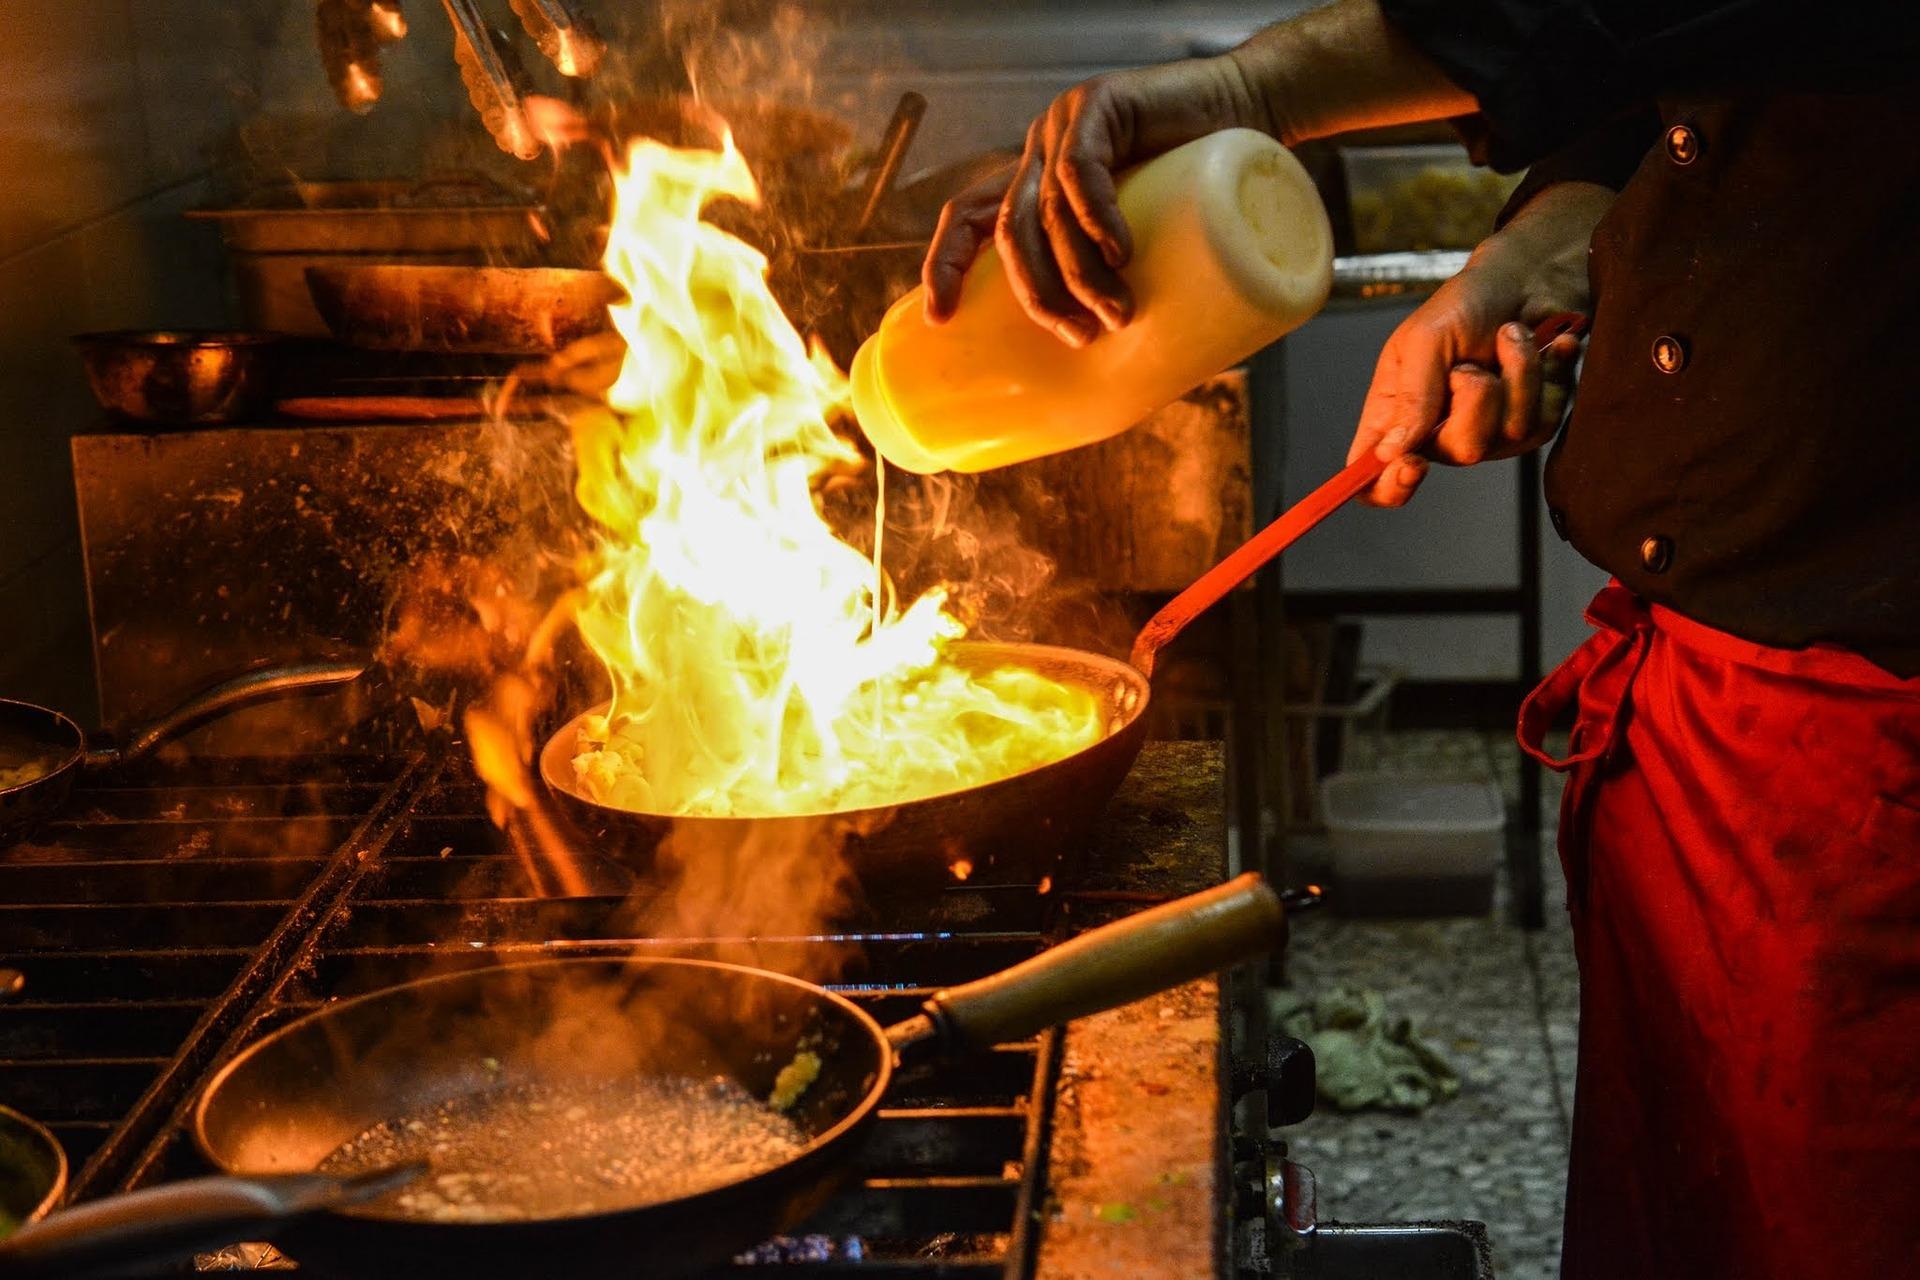 溫哥華餐廳行銷 chef cooking